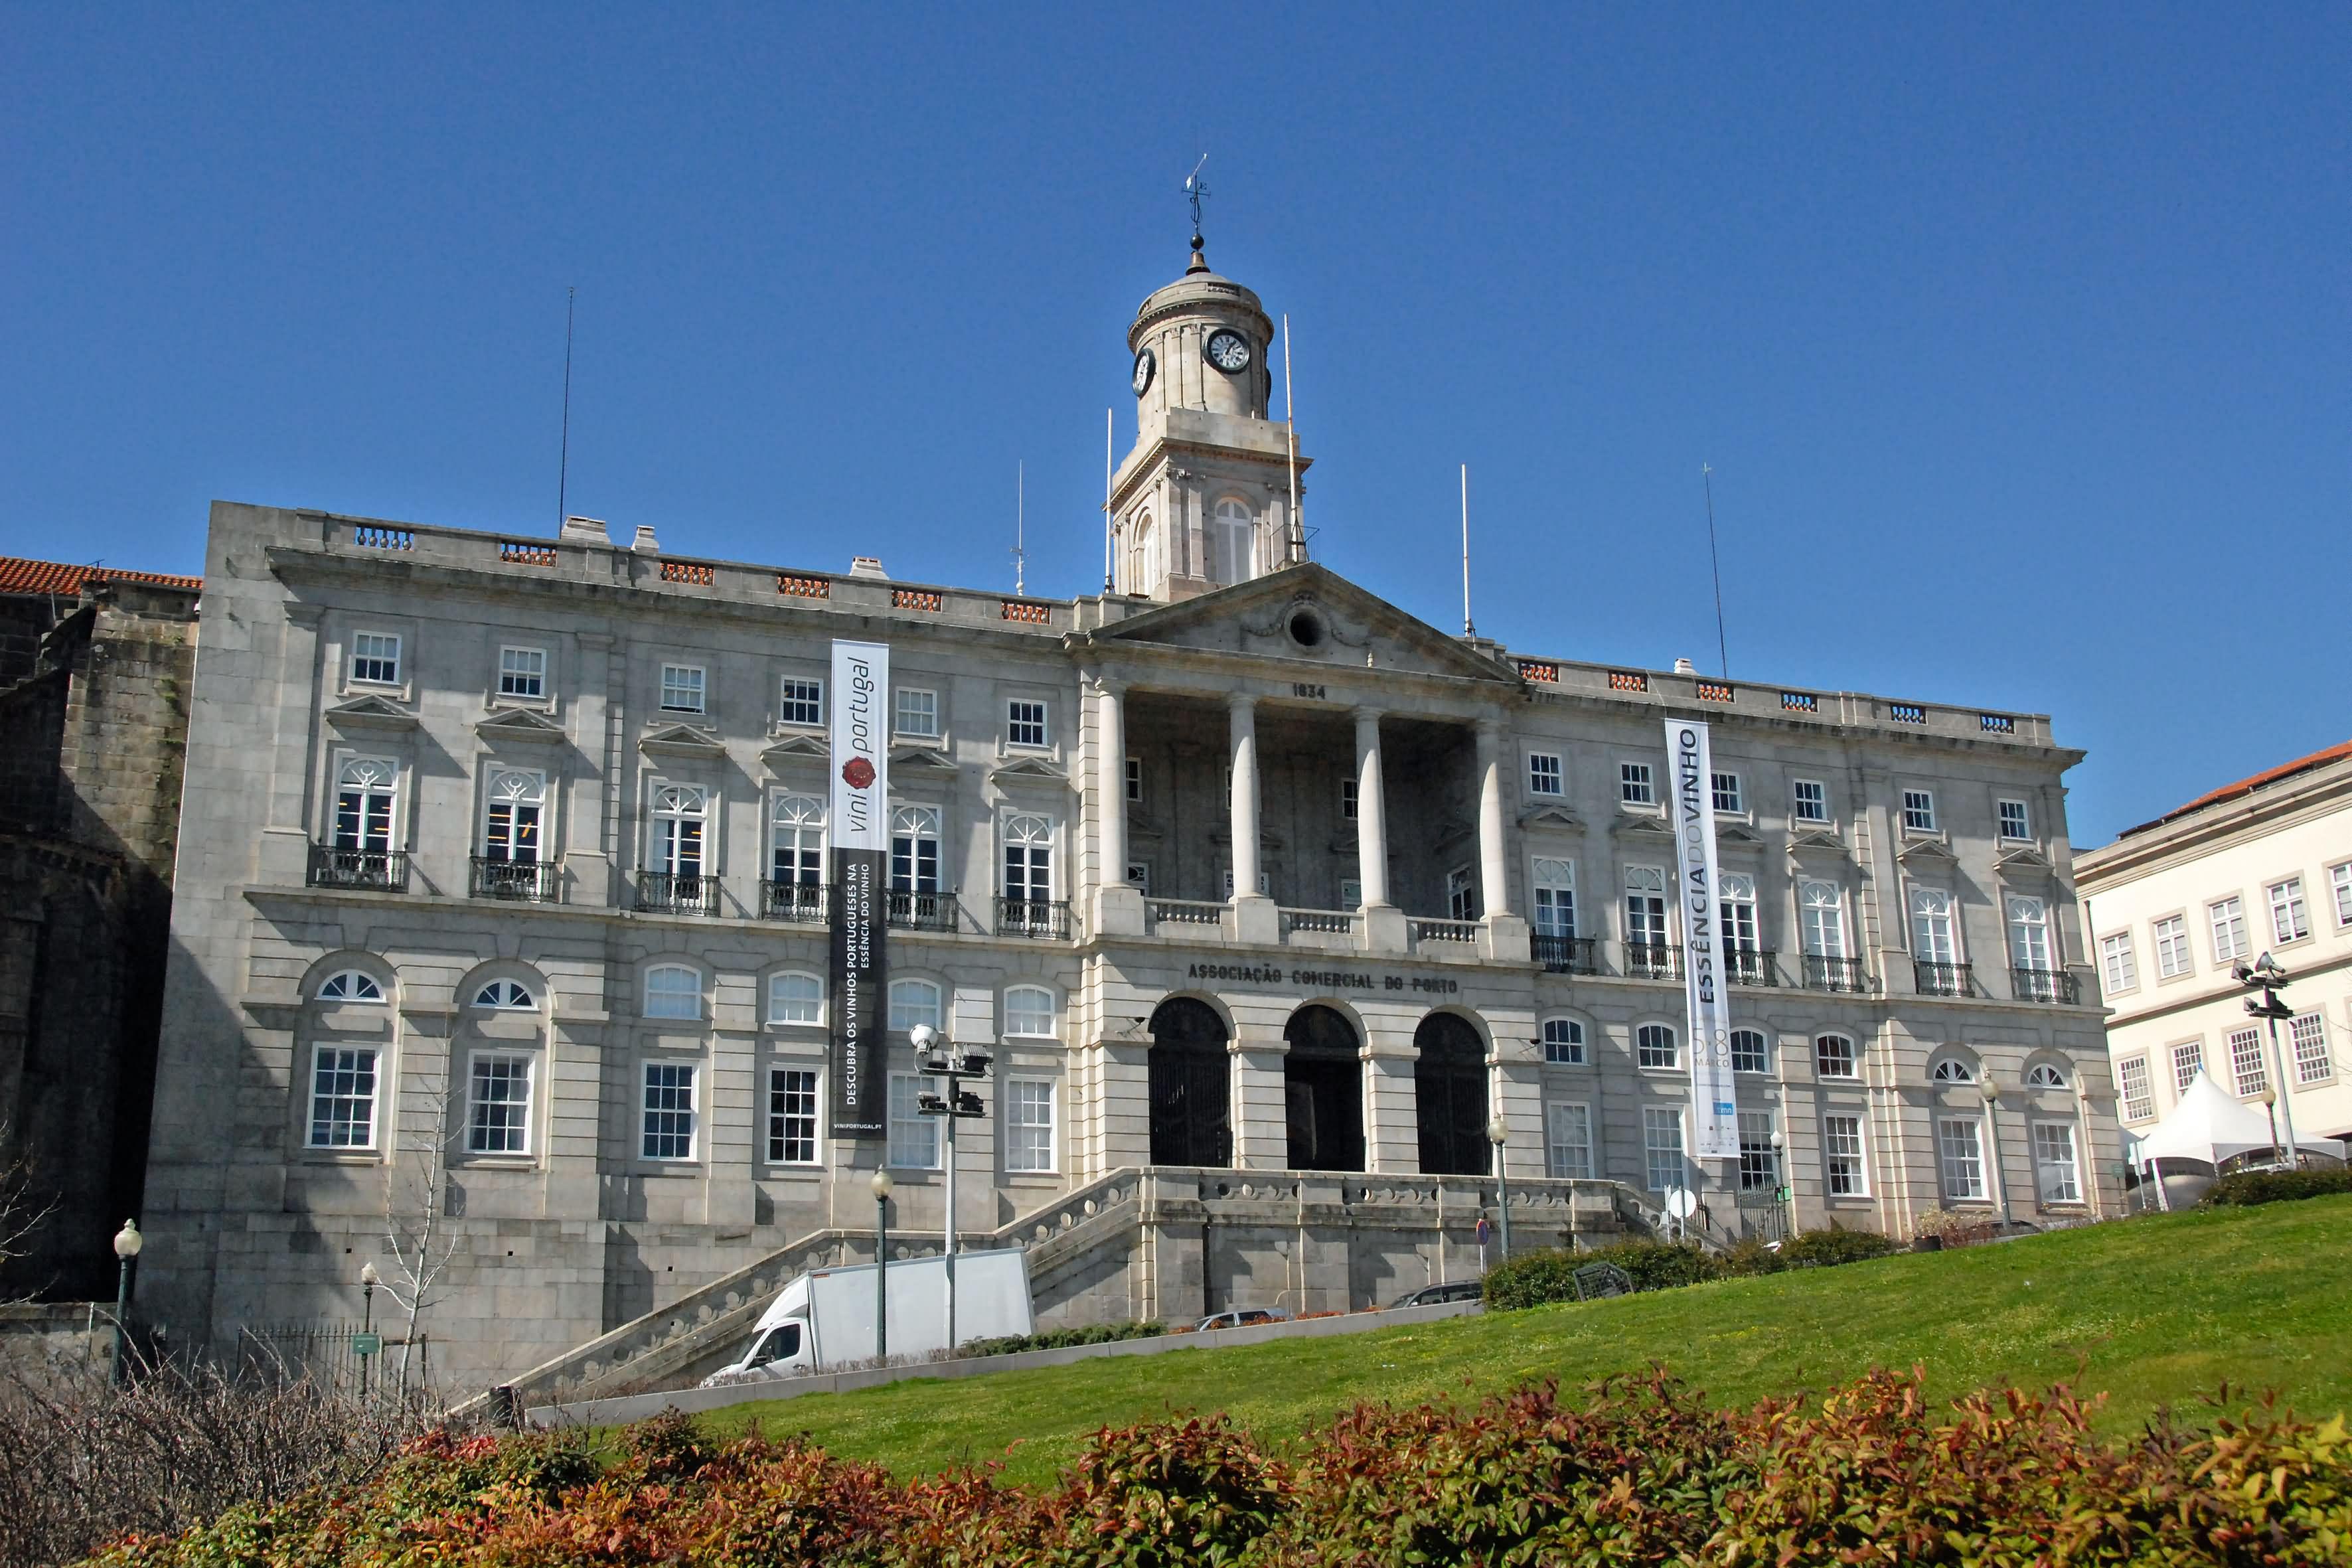 Amazing Facade Of The Palácio da Bolsa